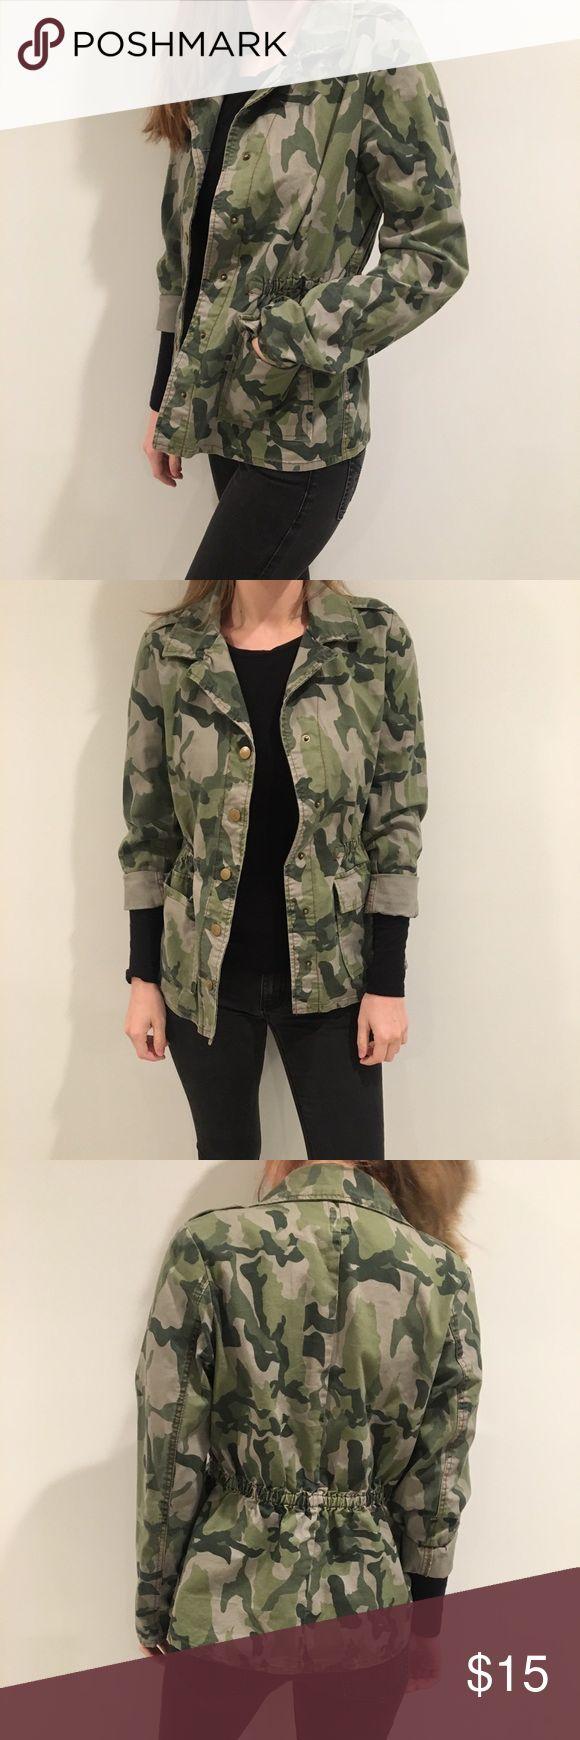 Army Camo Jacket size M, very lightweight Jackets & Coats